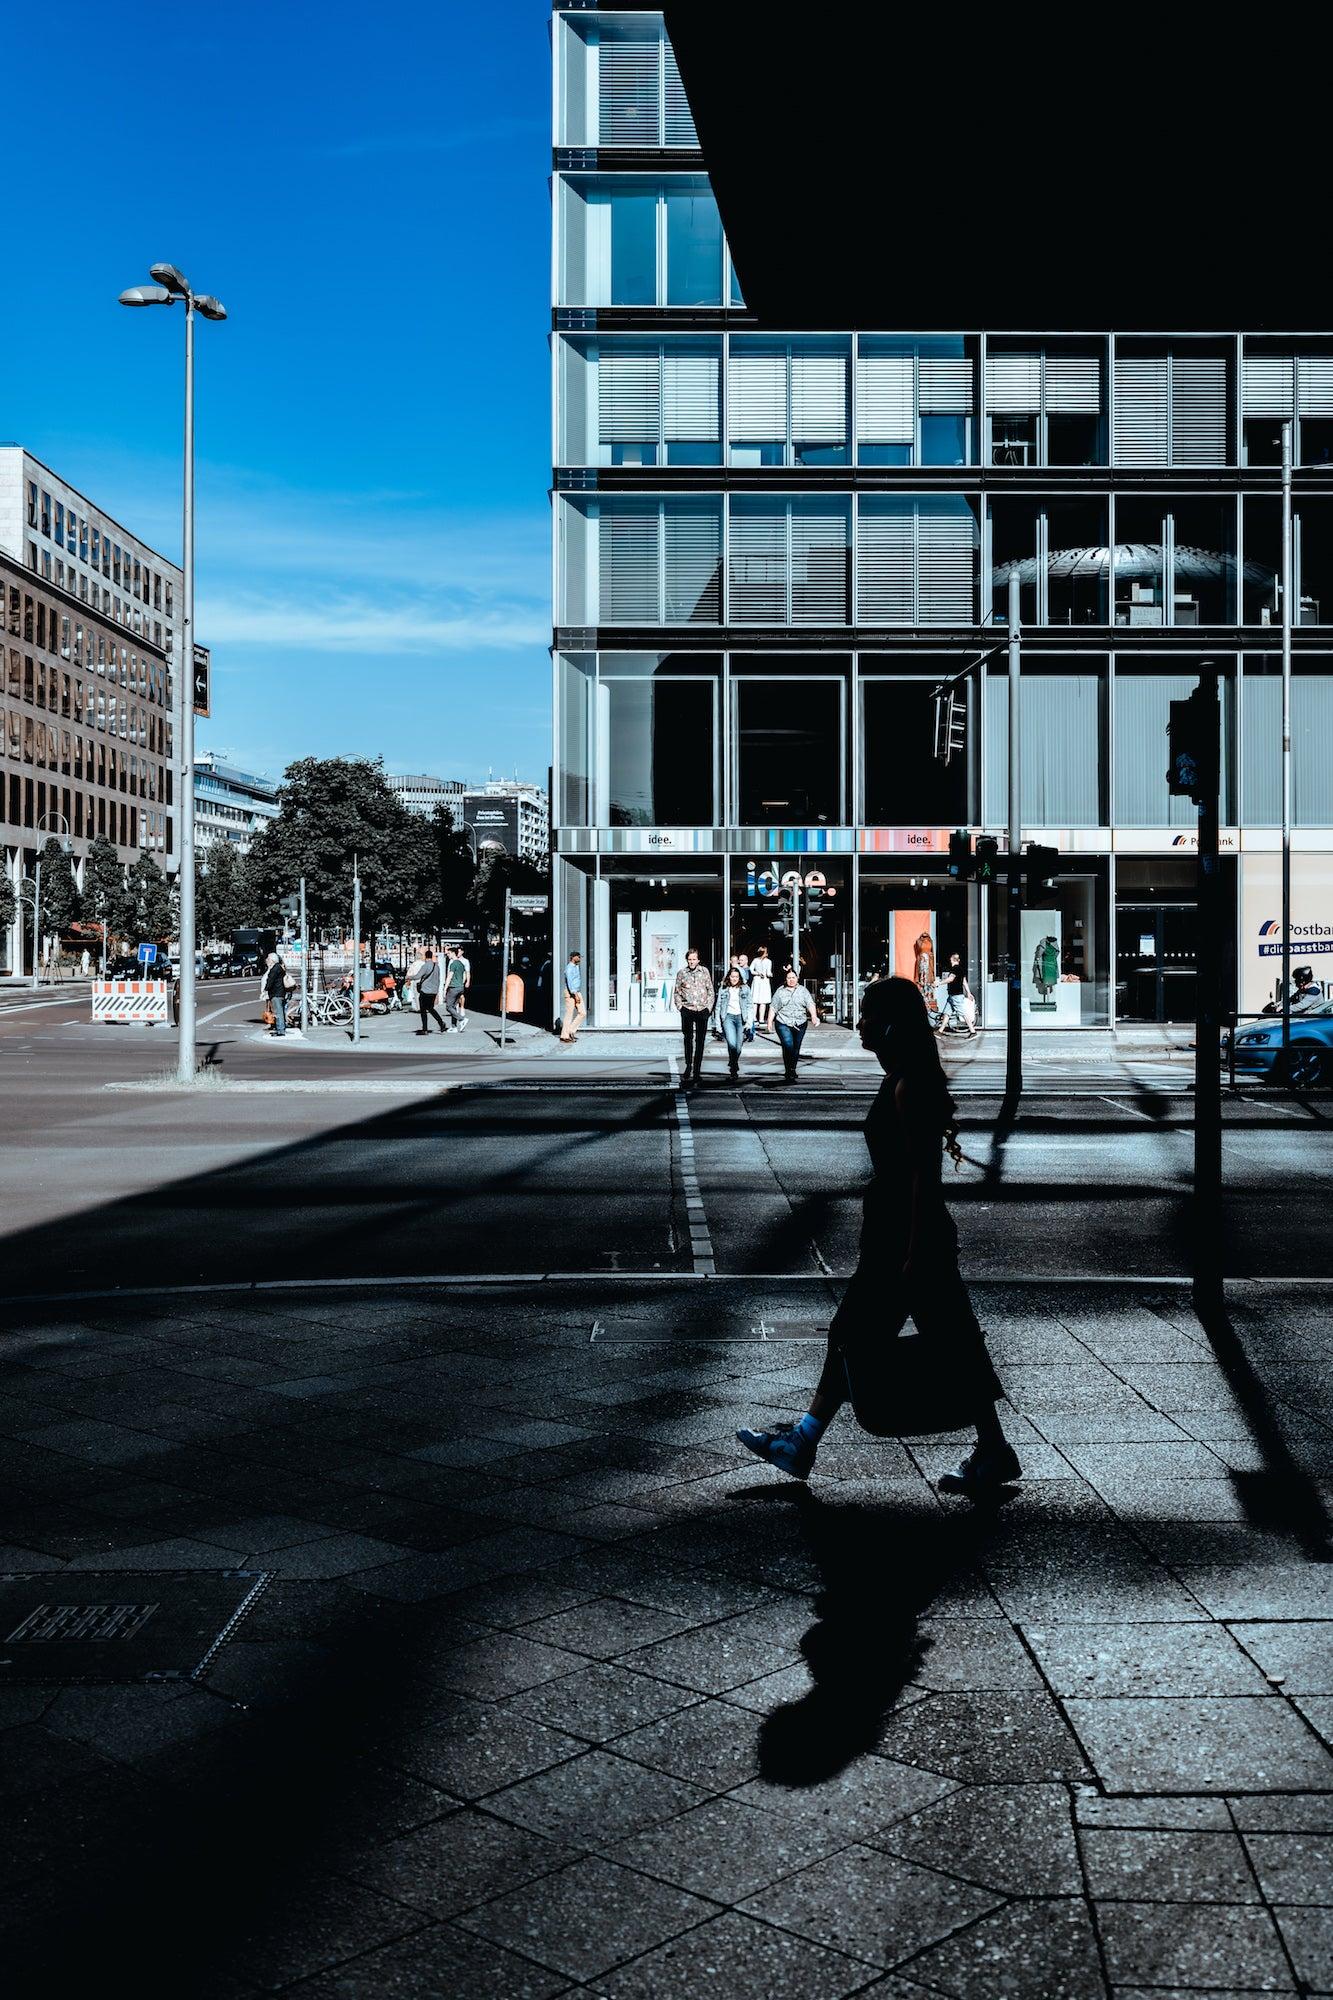 Alpha-Universe-Street-Photography-Marco-Wilm-35GM-3.jpg